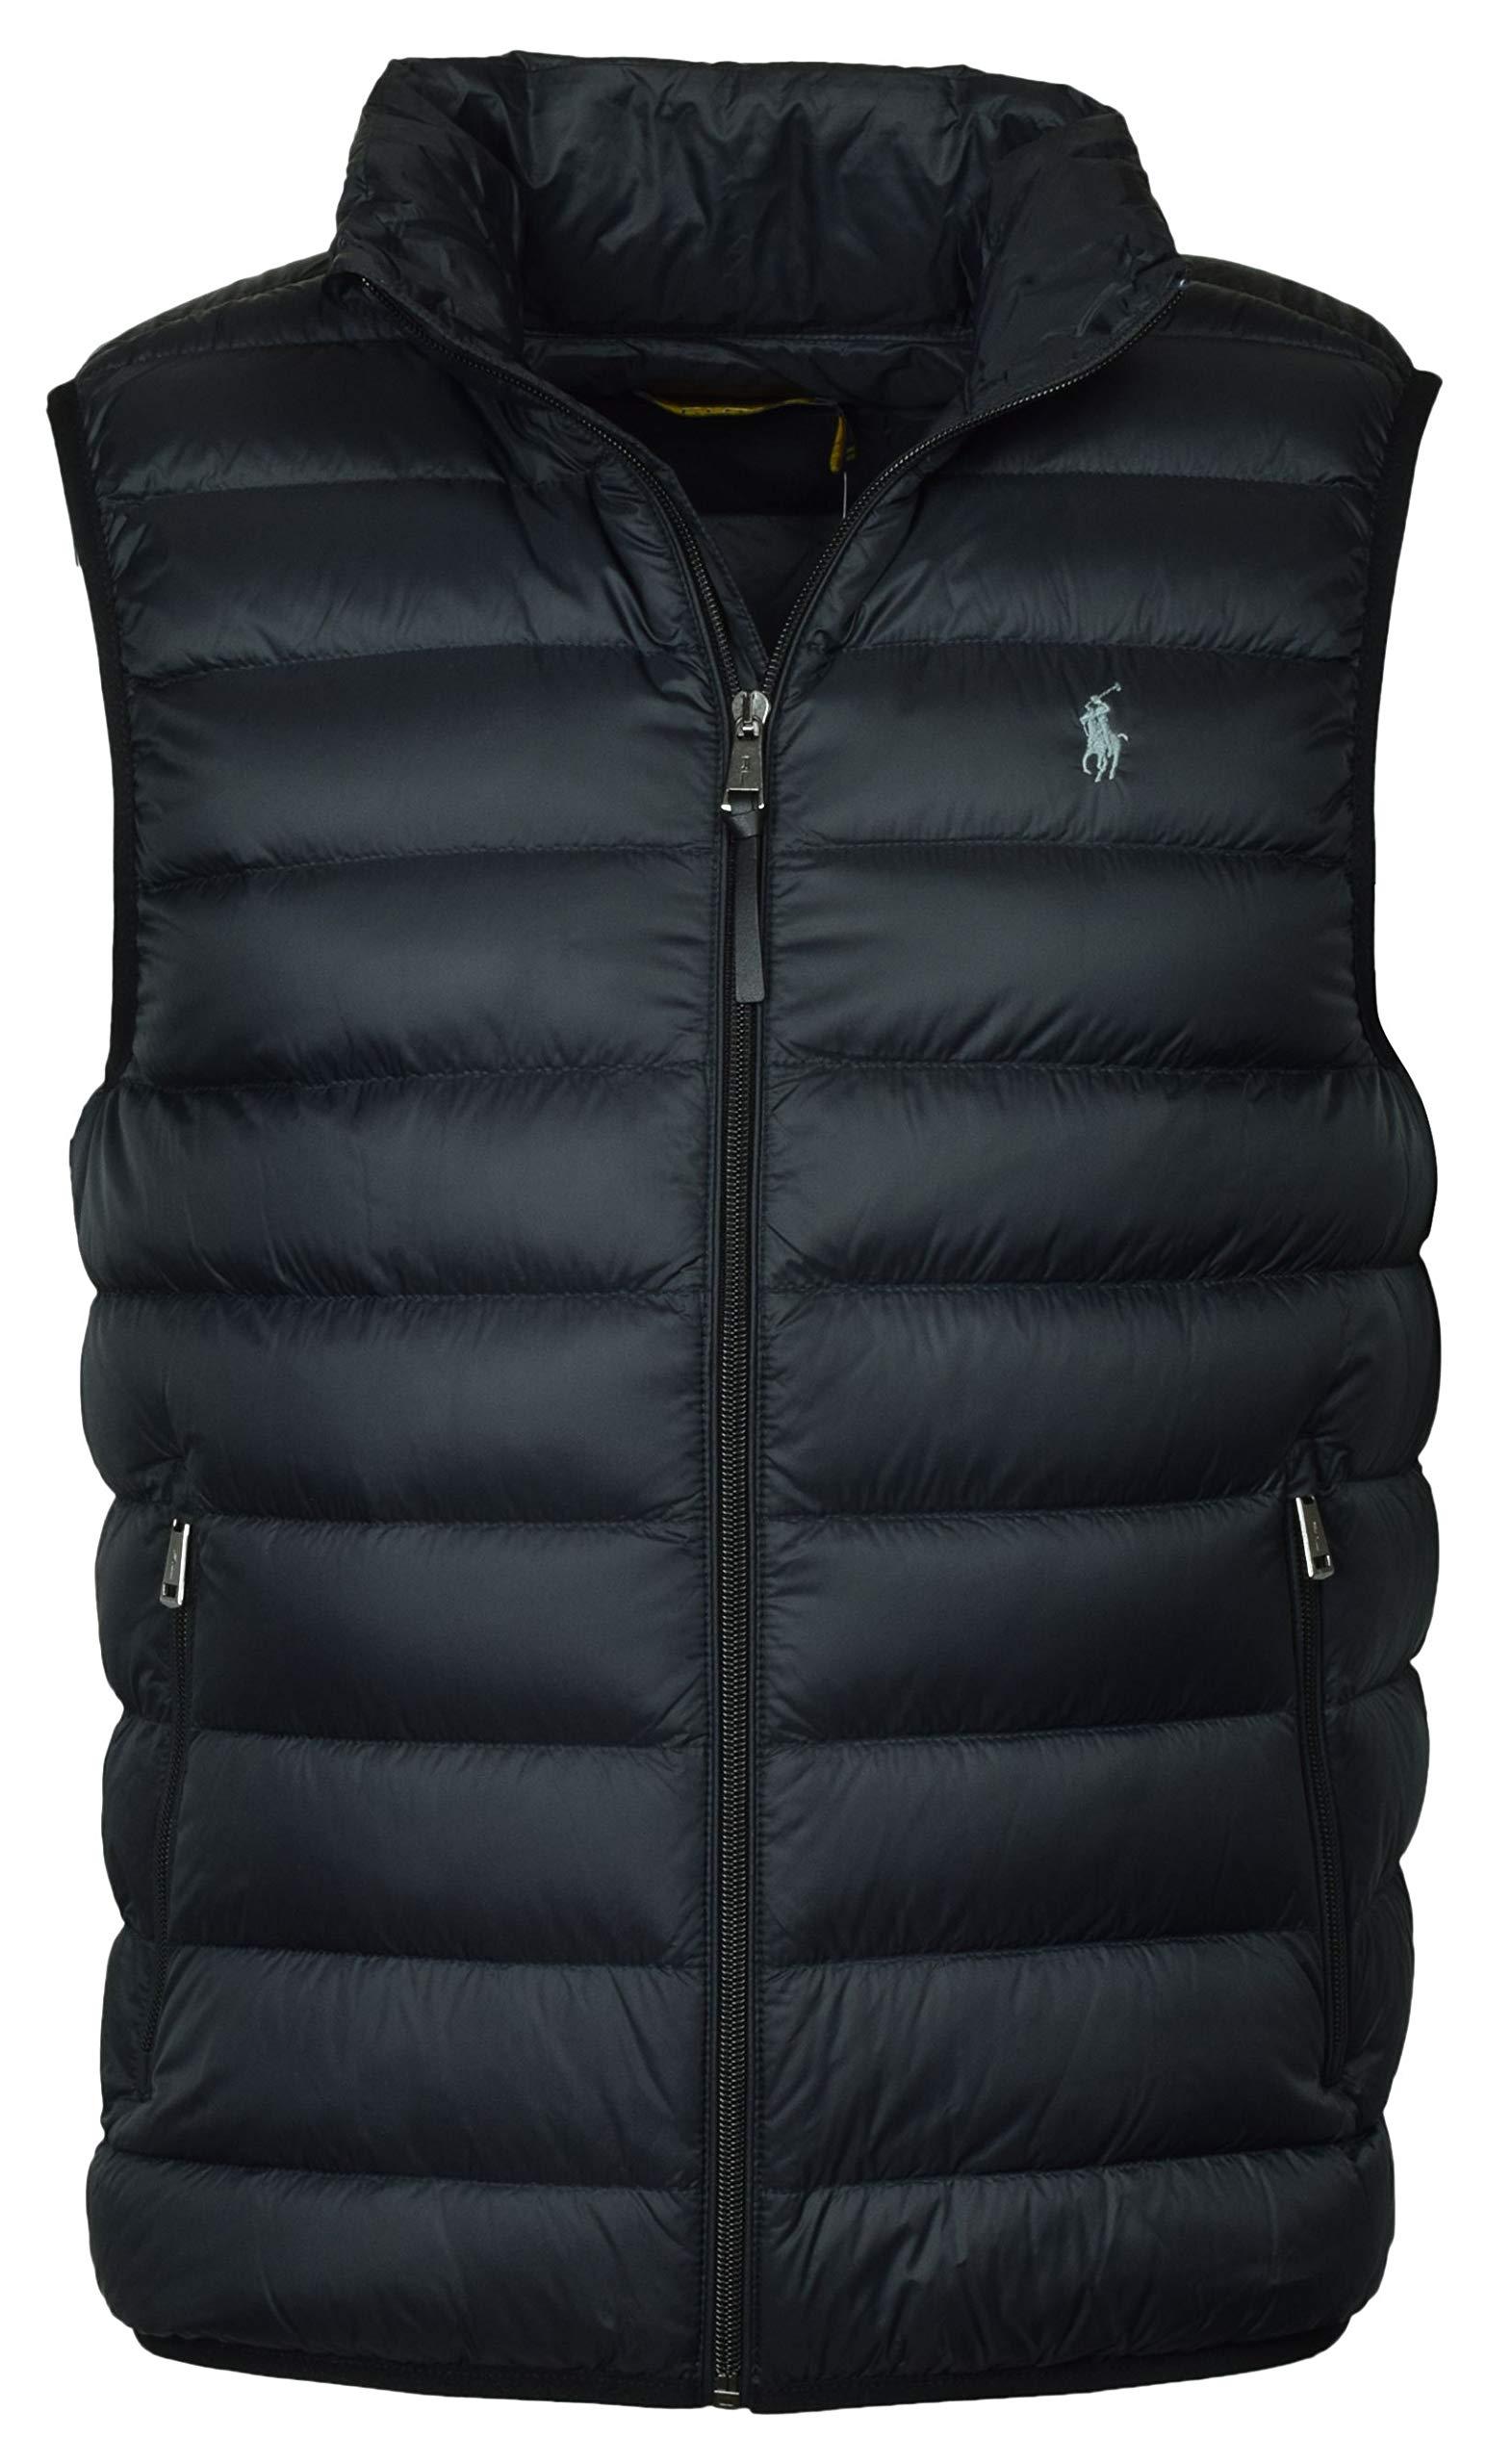 Polo Ralph Lauren Mens Full Zip Puffer Vest (Medium, Polo Black) by Polo Ralph Lauren